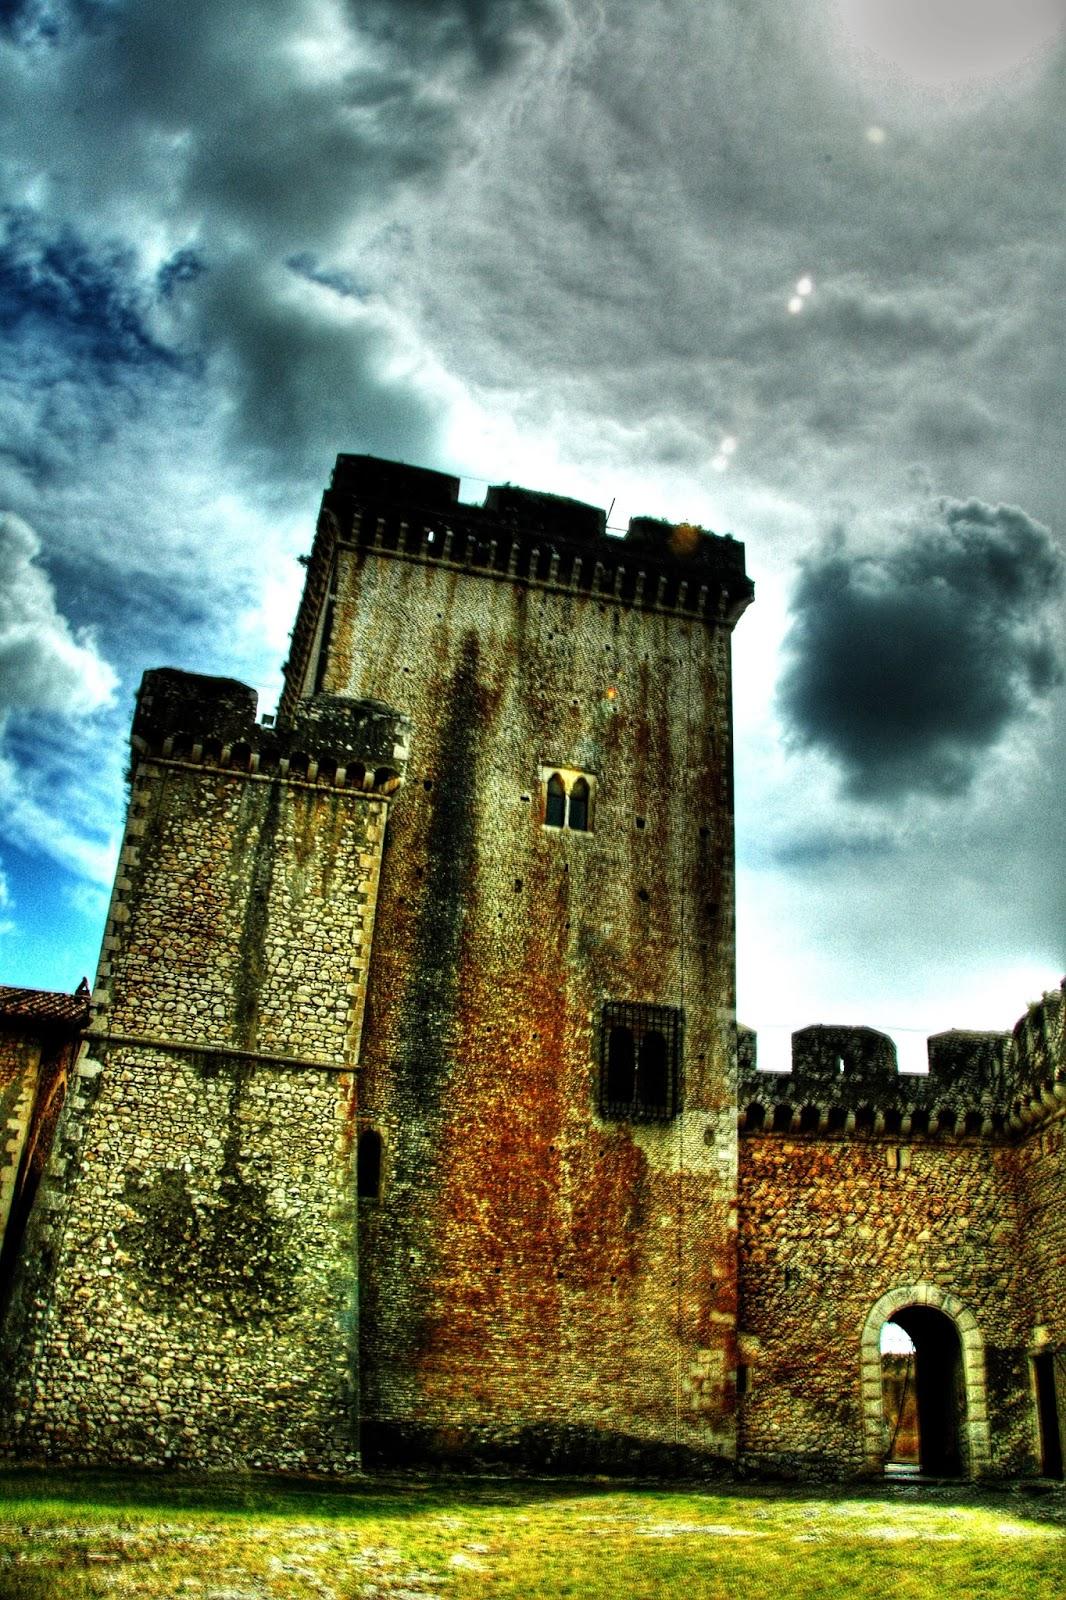 Burgo Medieval e Castelo de Sermoneta